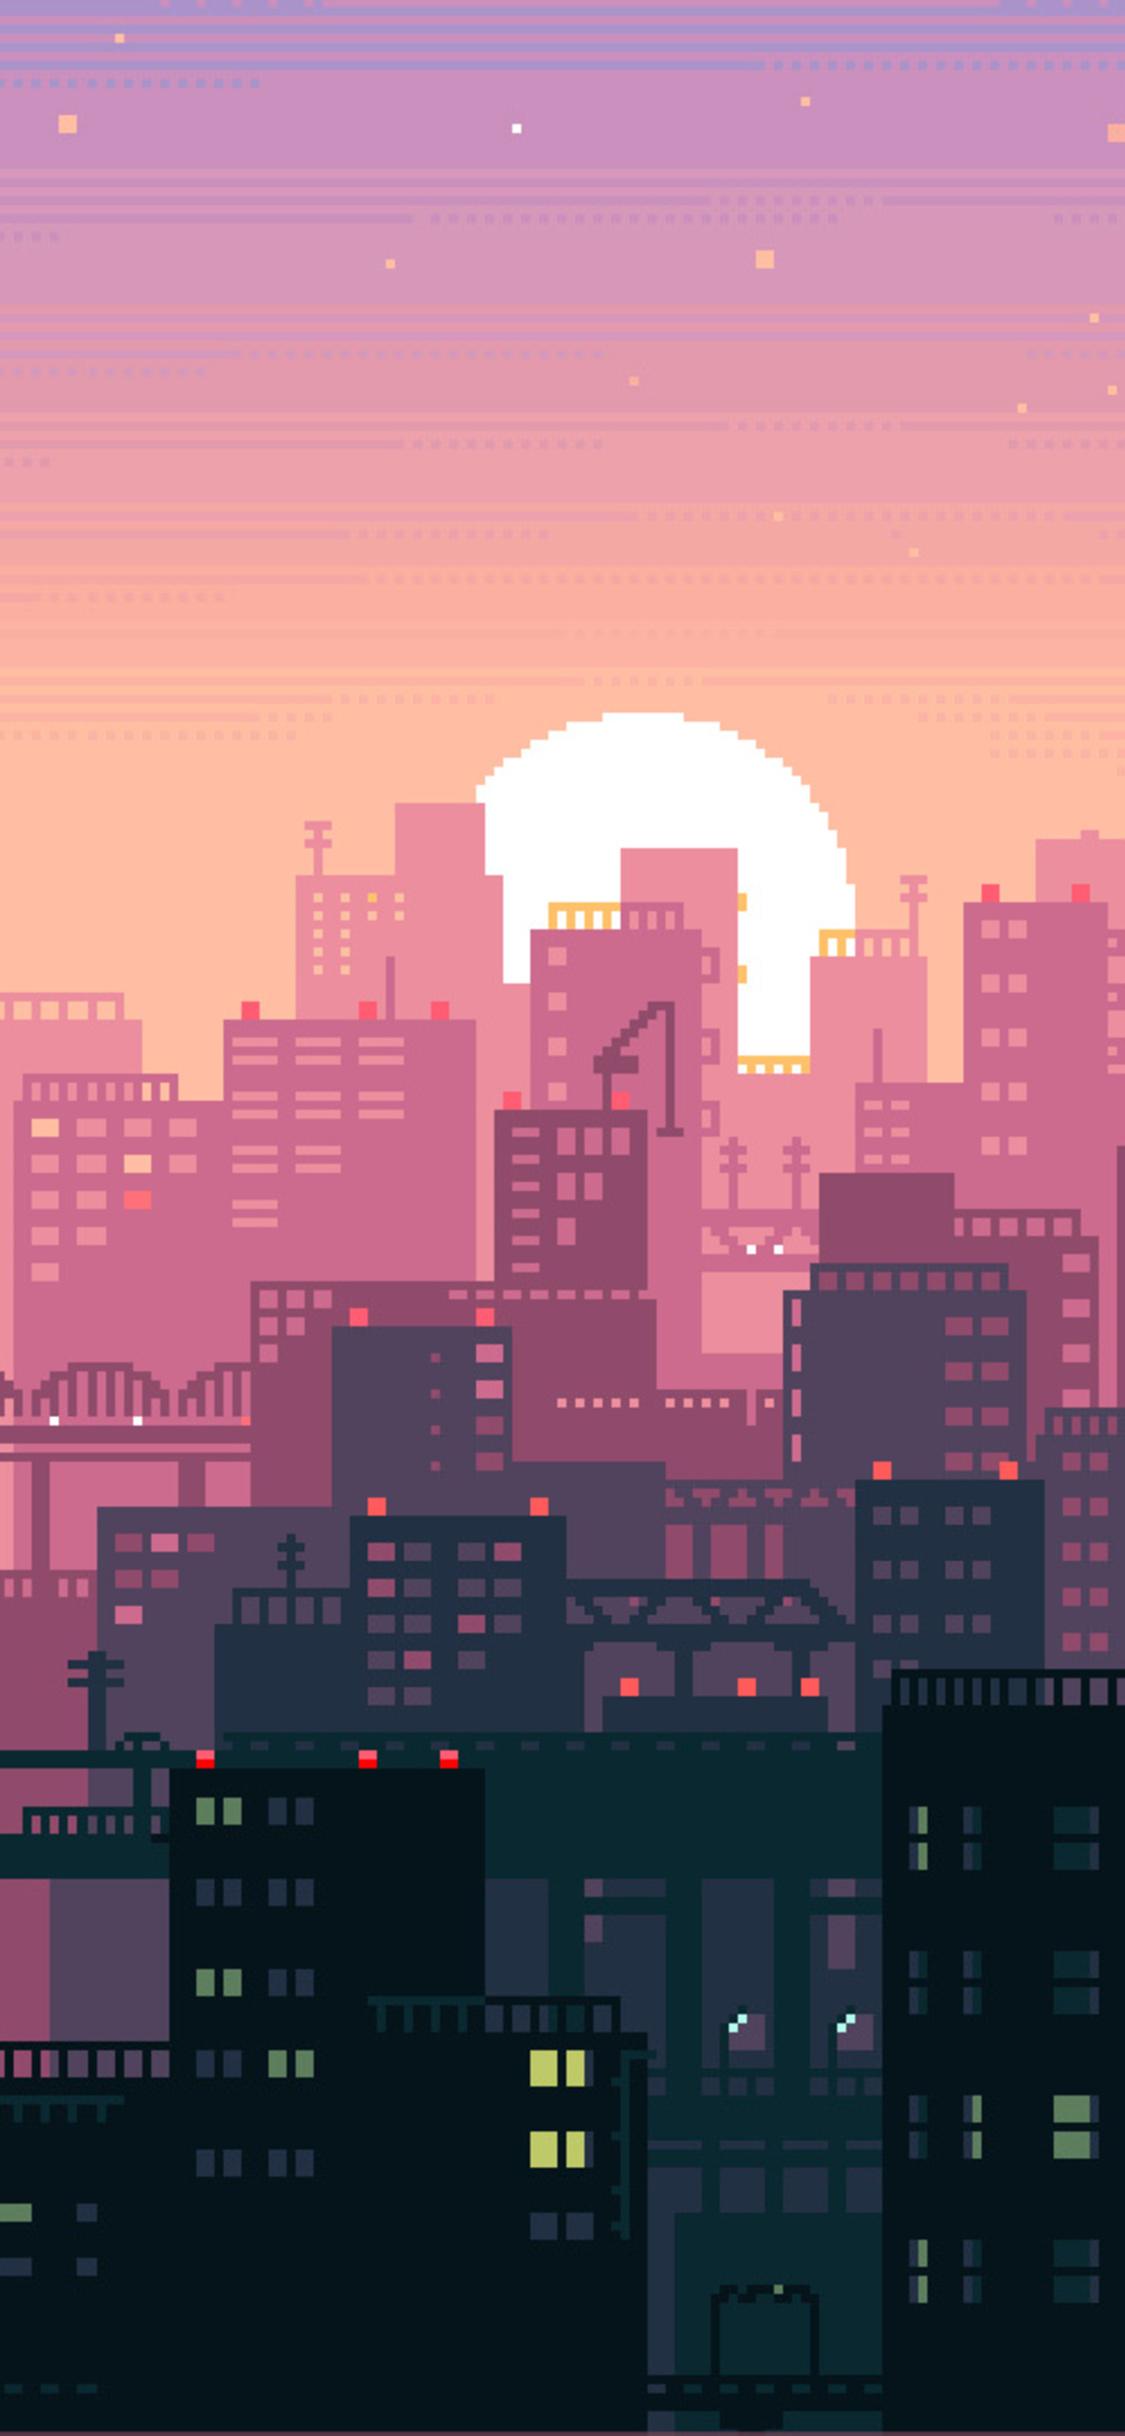 8 Bit Pixel Art City (Iphone XS,Iphone 10,Iphone X)